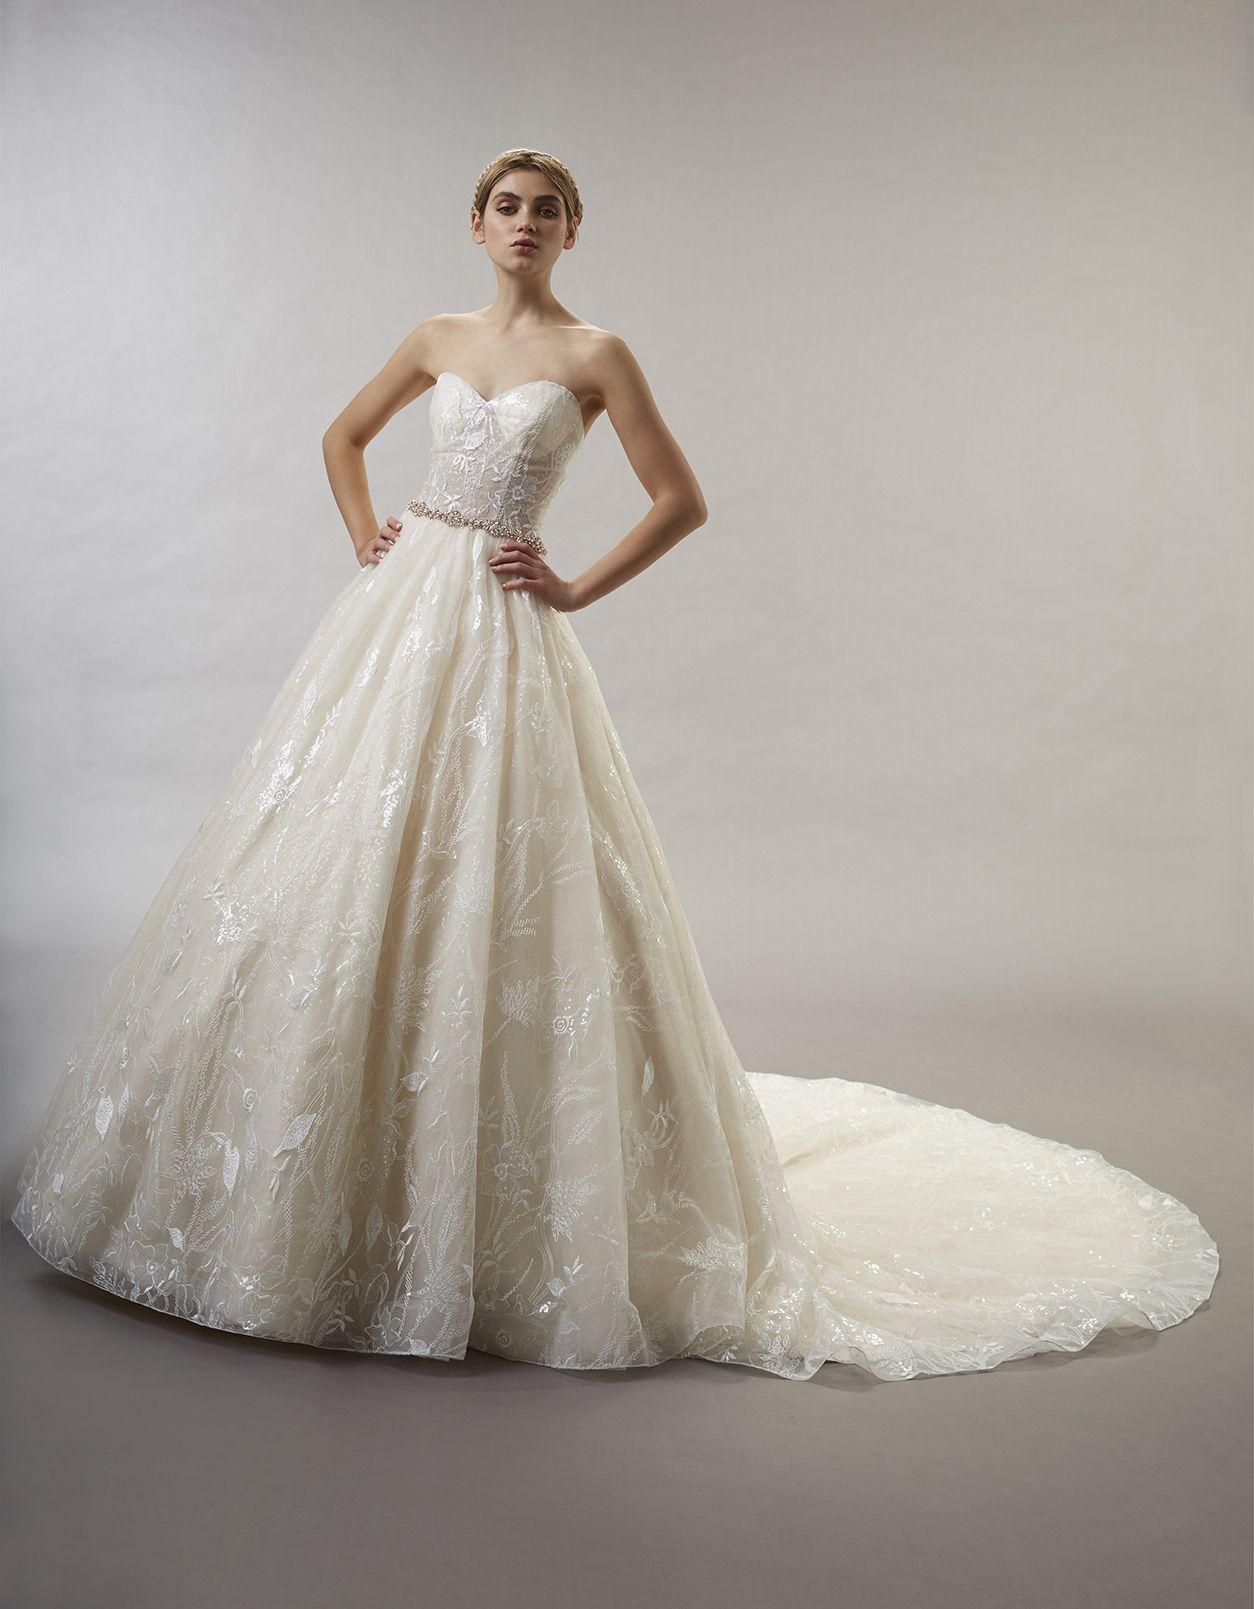 Fairytale like ball gown wedding dress style name